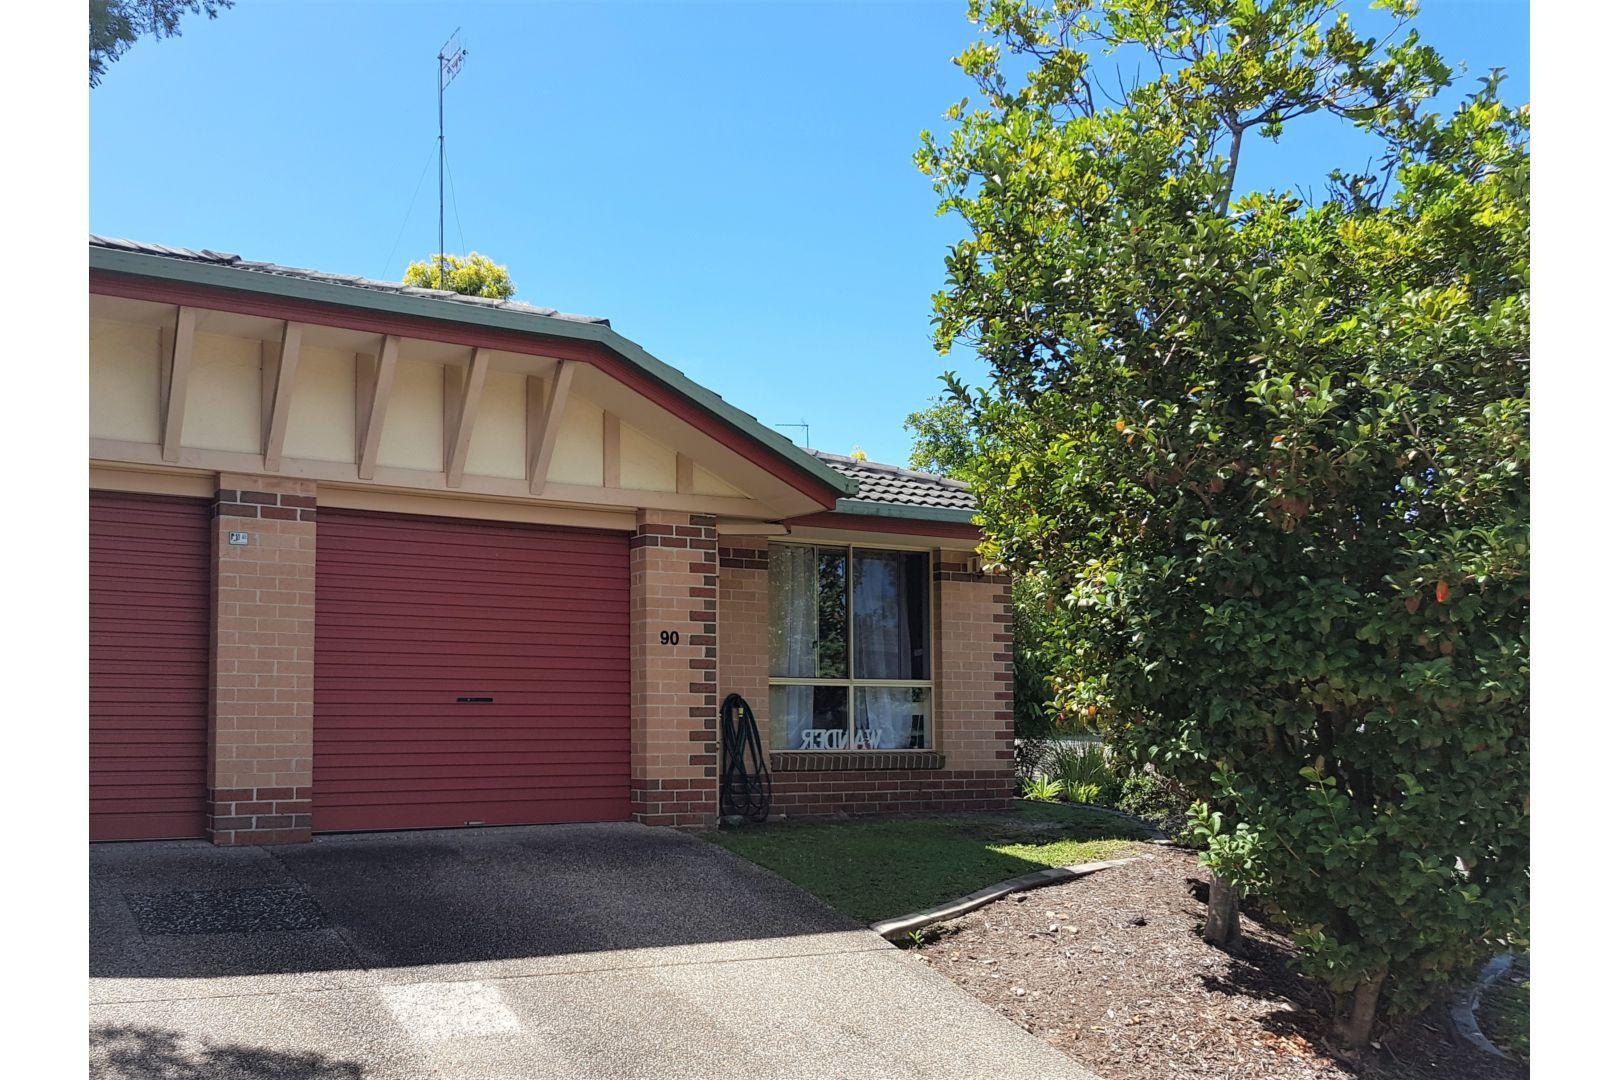 90/1 Bridgman Drive, Reedy Creek QLD 4227, Image 0